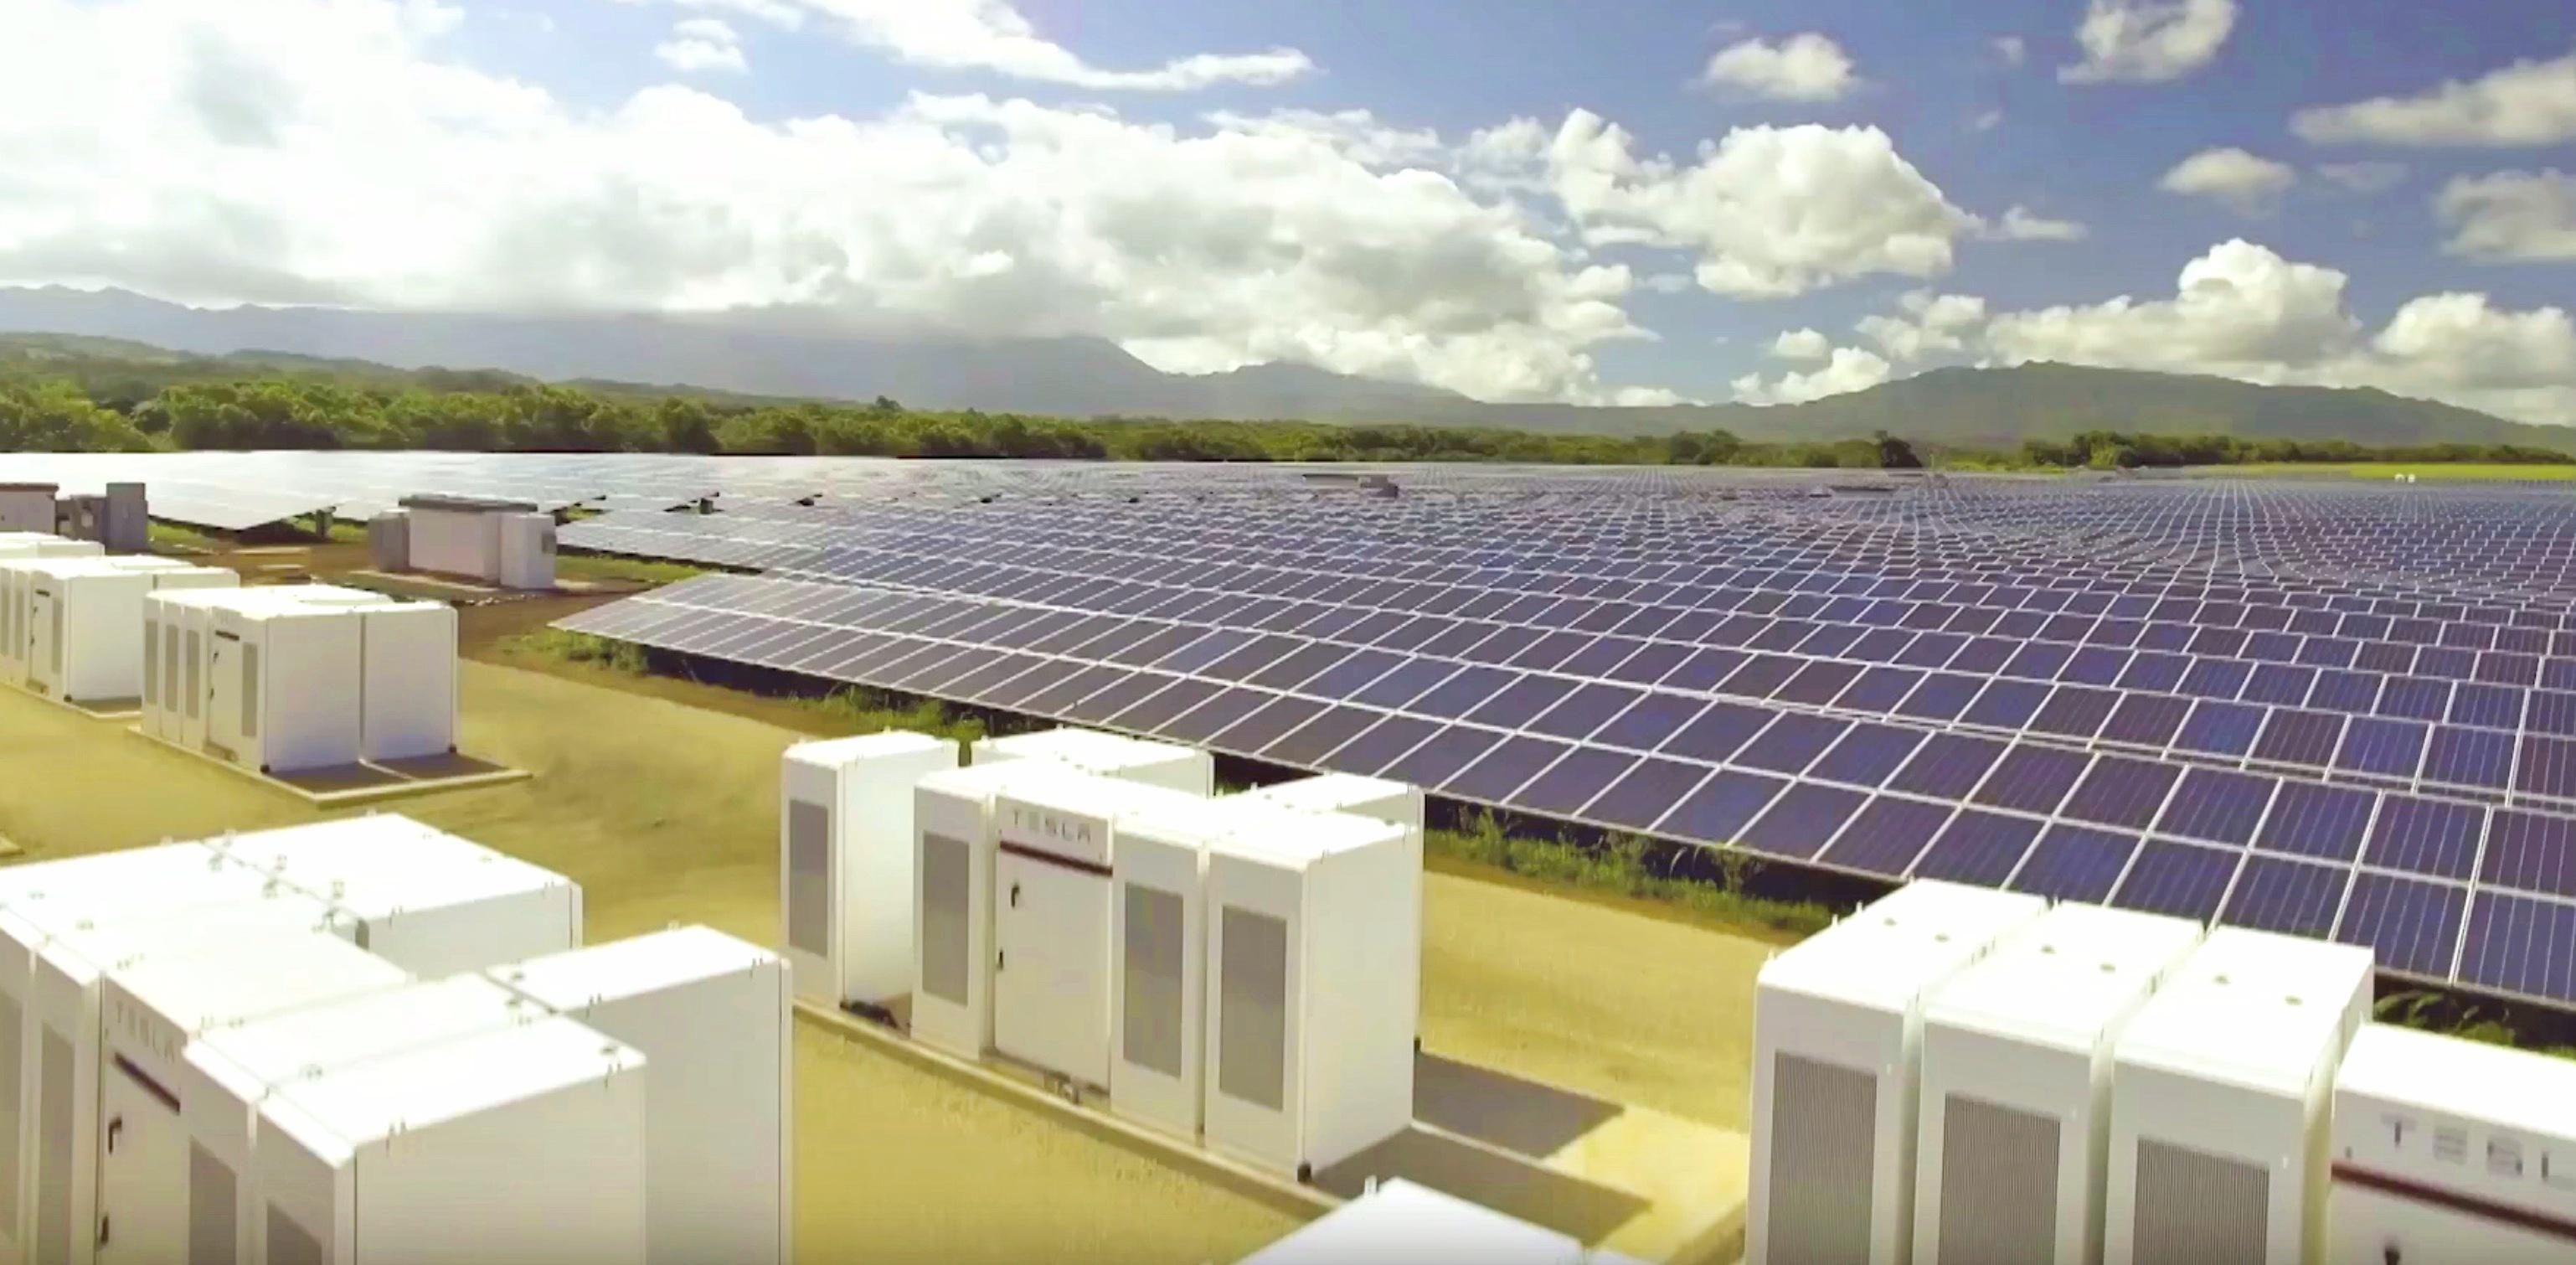 Hbo S Vice Puts Tesla Cto Jb Straubel And Kauai S Solar